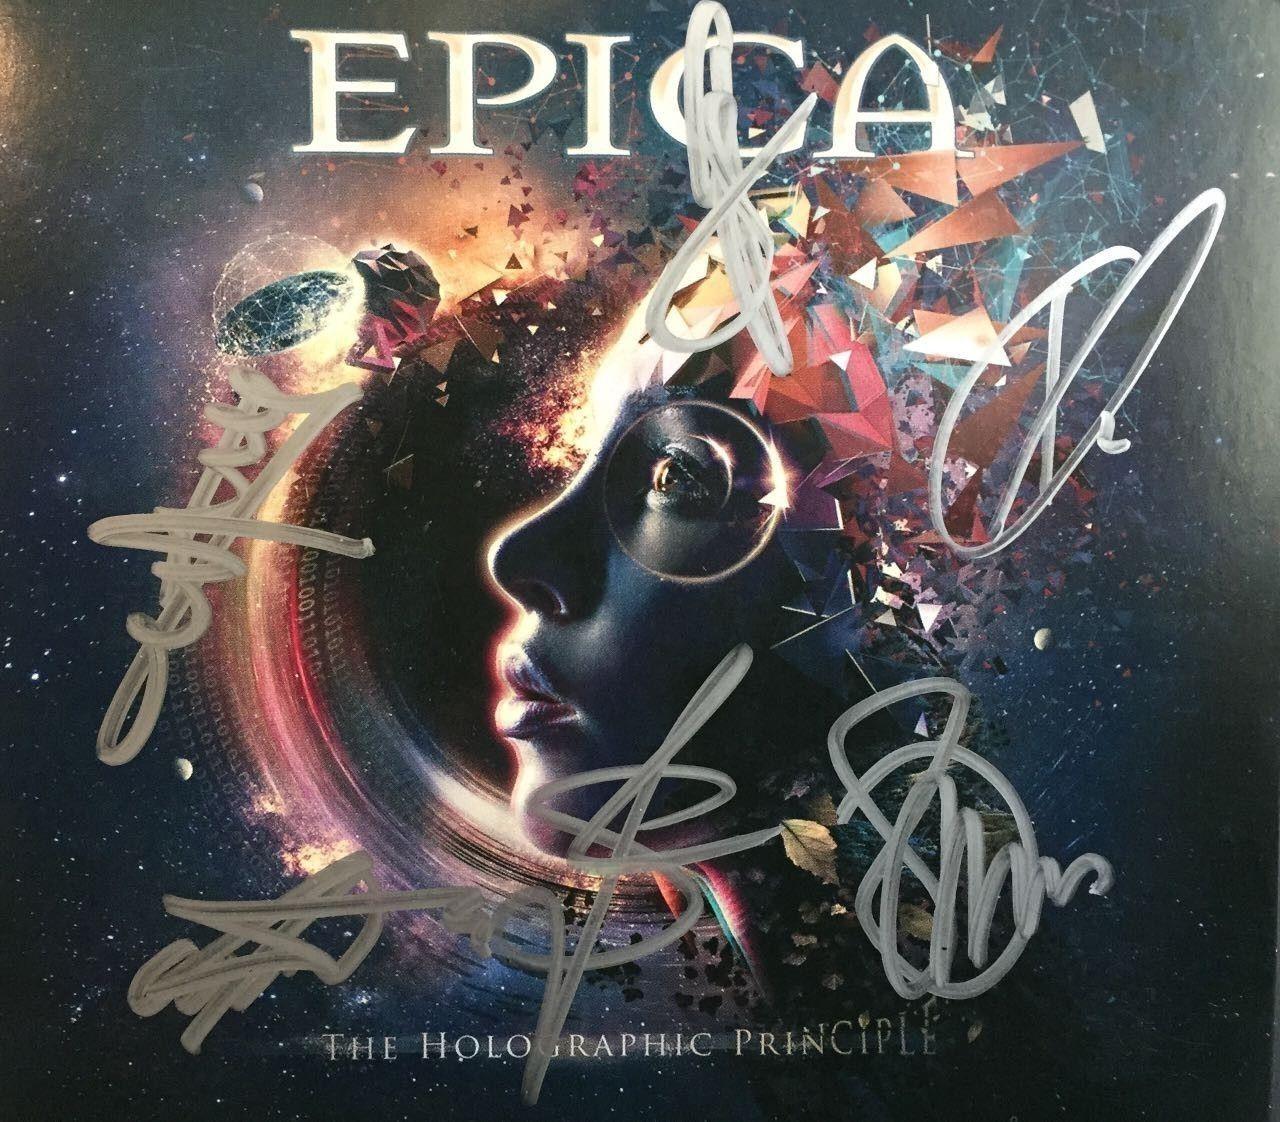 CD - Epica - The Holographic Principle - DUPLO - Autografado